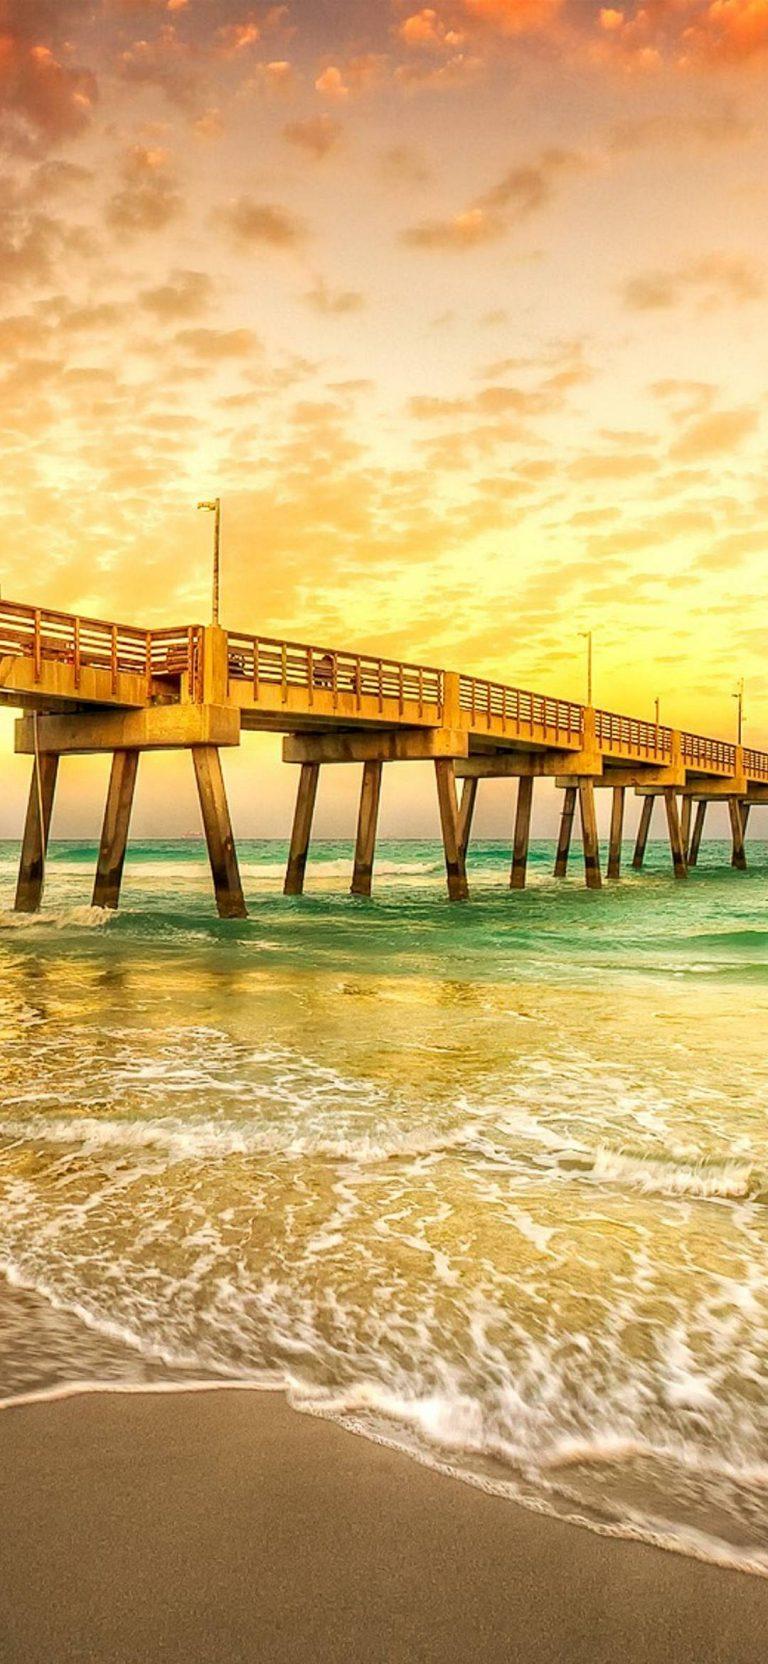 Water Sunset Sunrise Ocean Bridges 1080x2340 768x1664